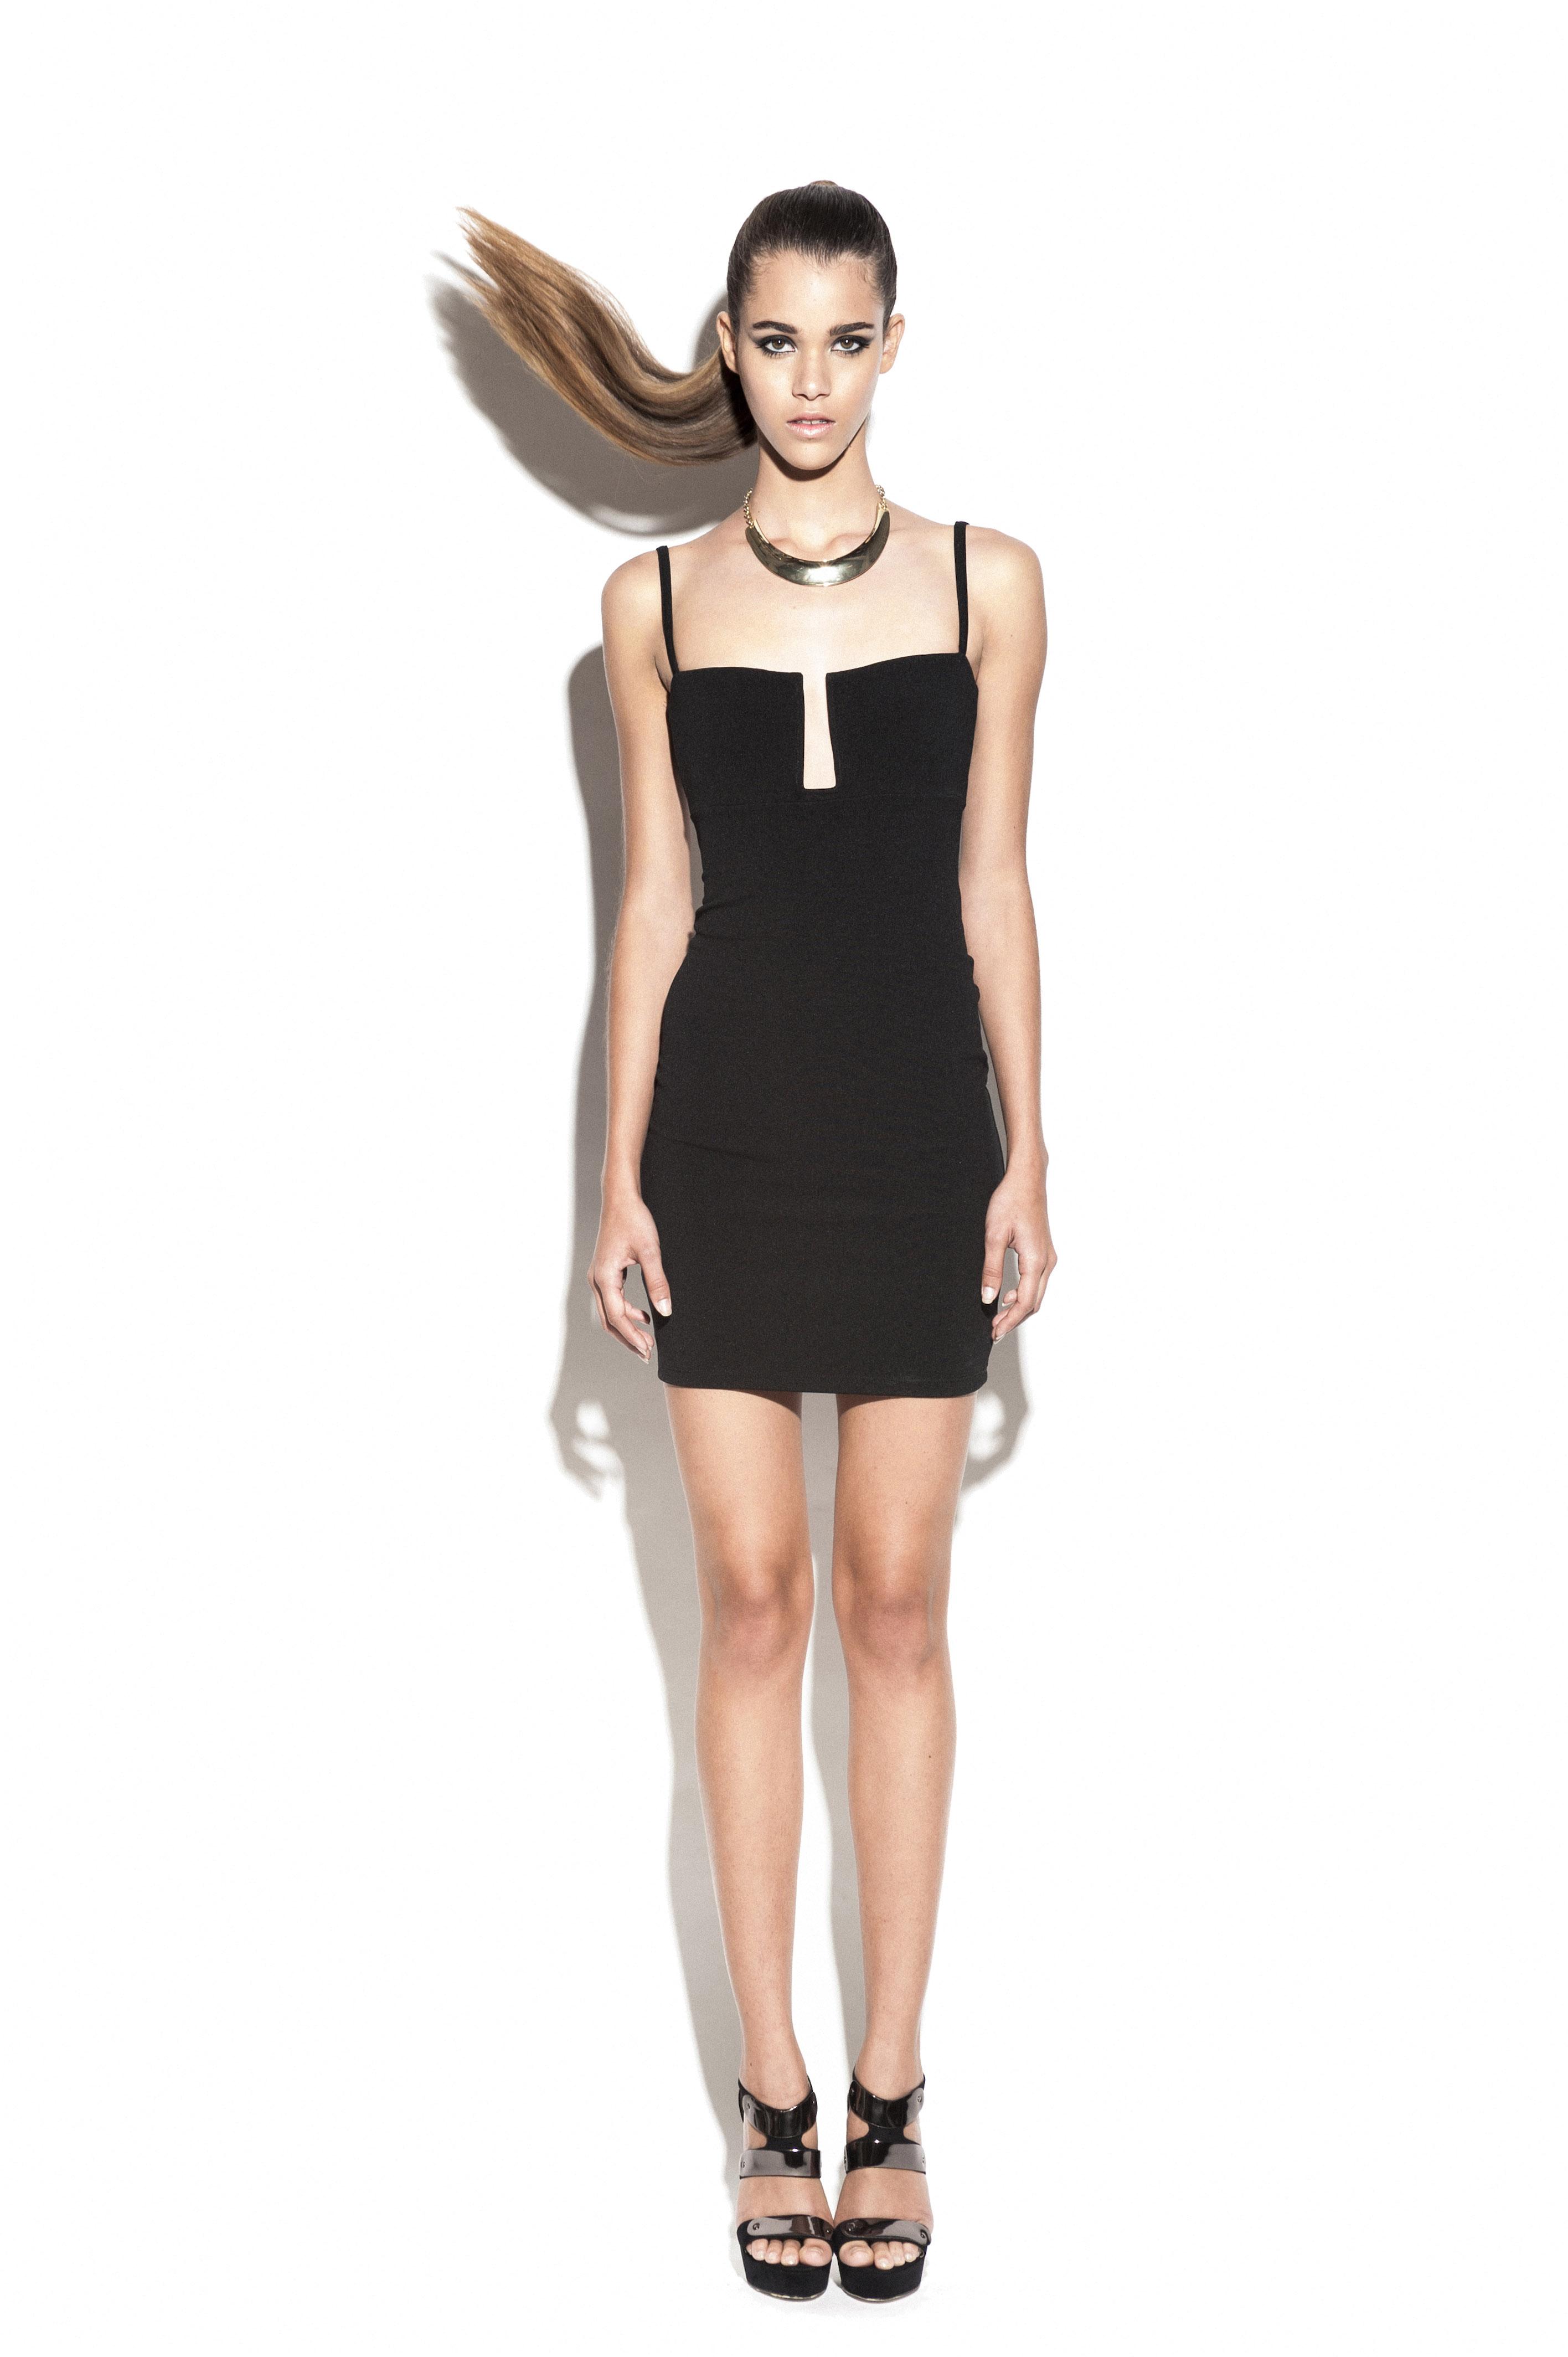 Black Stadium Bustier Dress : Buy Designer Dresses Online at Nookie